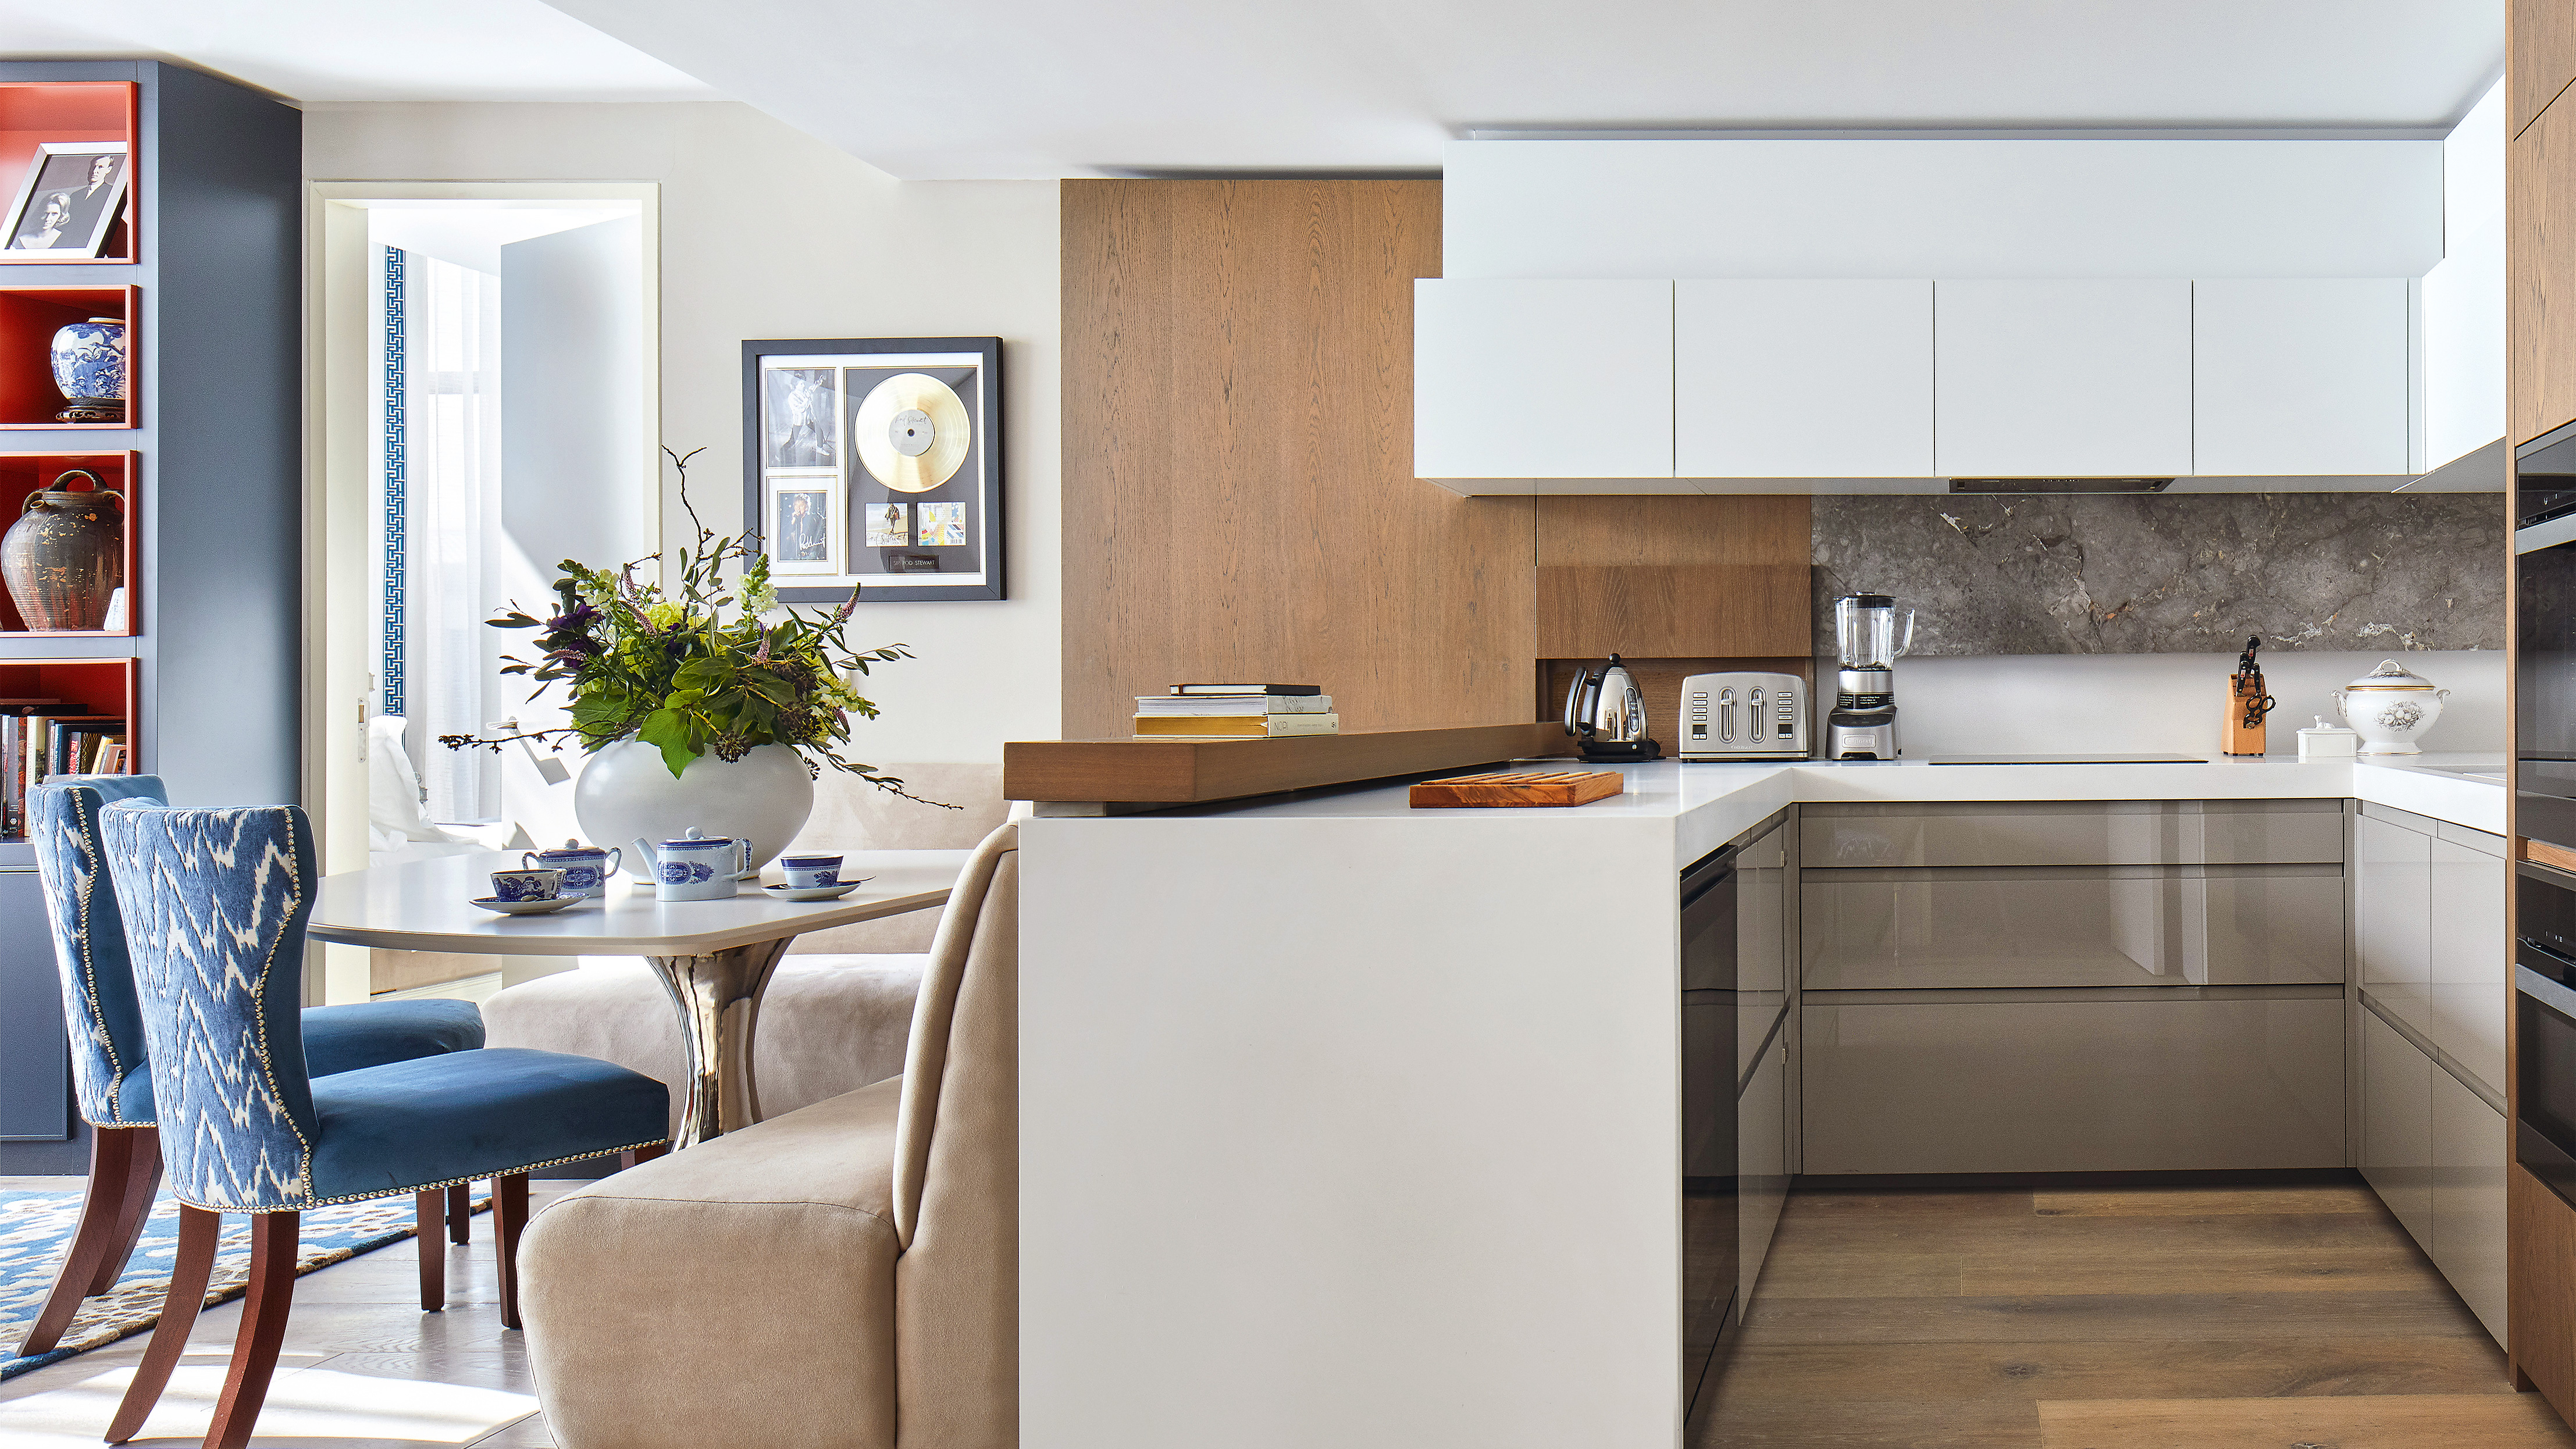 Small Kitchen Ideas Small Kitchen Design Ideas For Storage Homes Gardens